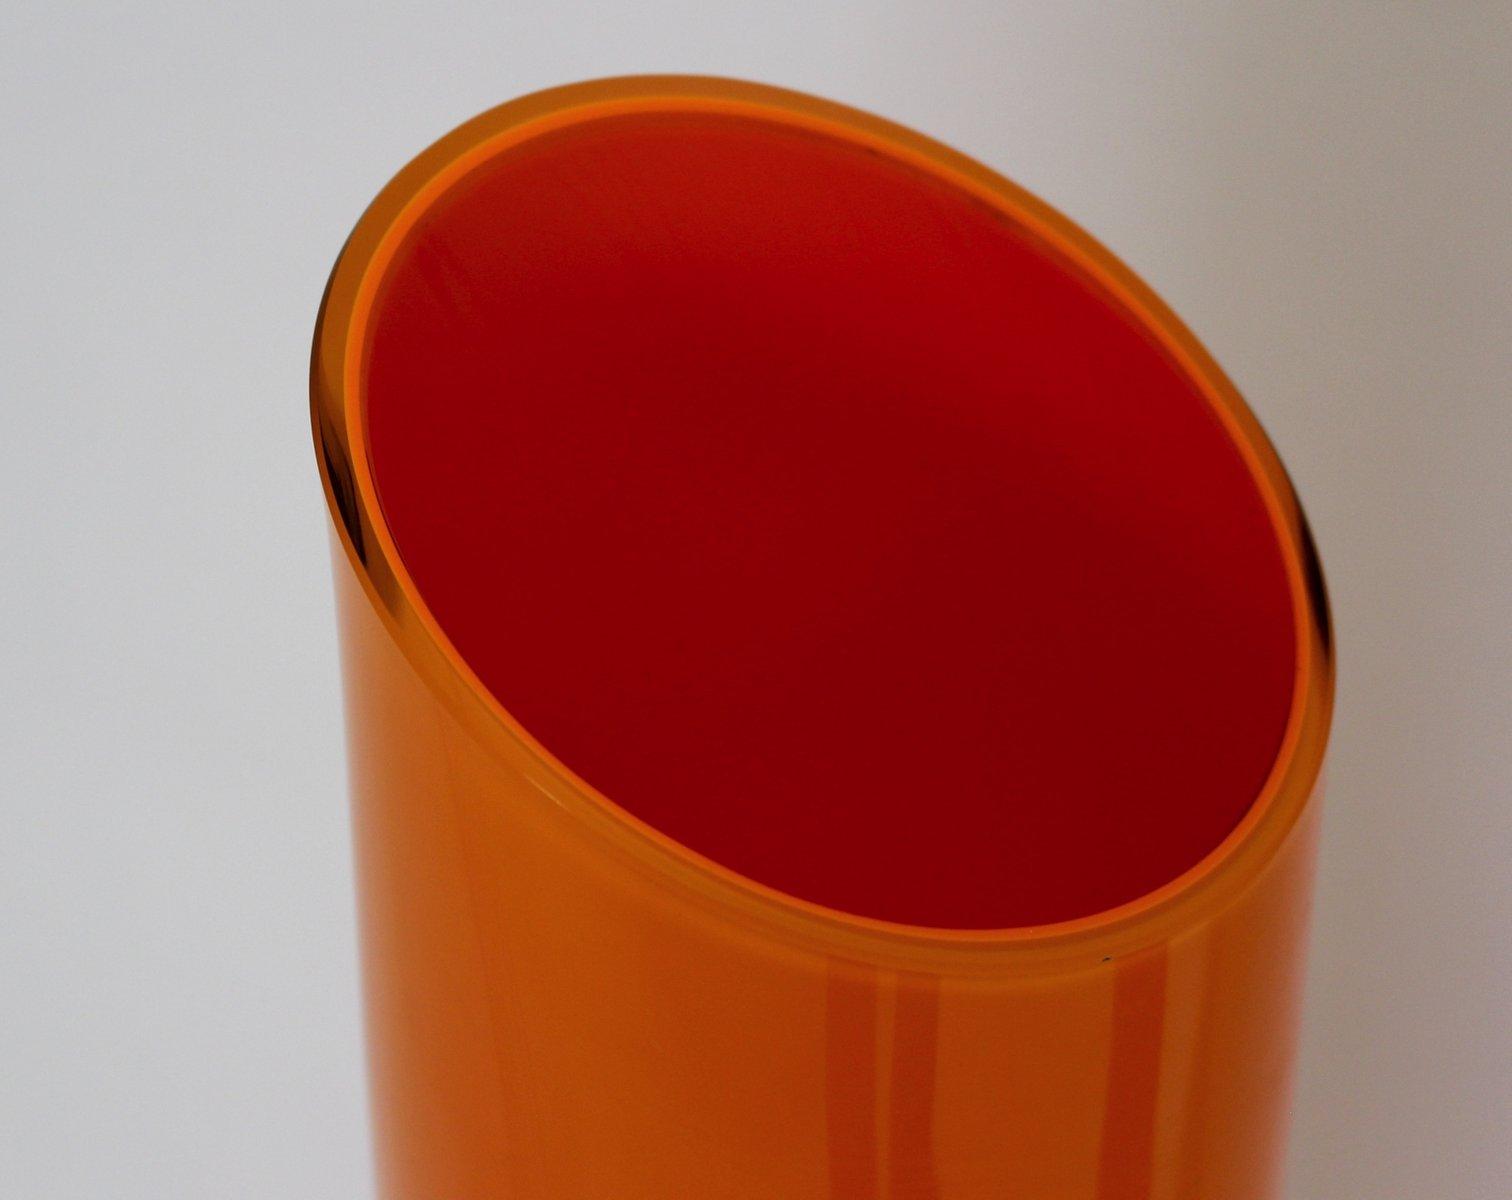 vases orange en verre italie 1970s set de 2 en vente sur pamono. Black Bedroom Furniture Sets. Home Design Ideas